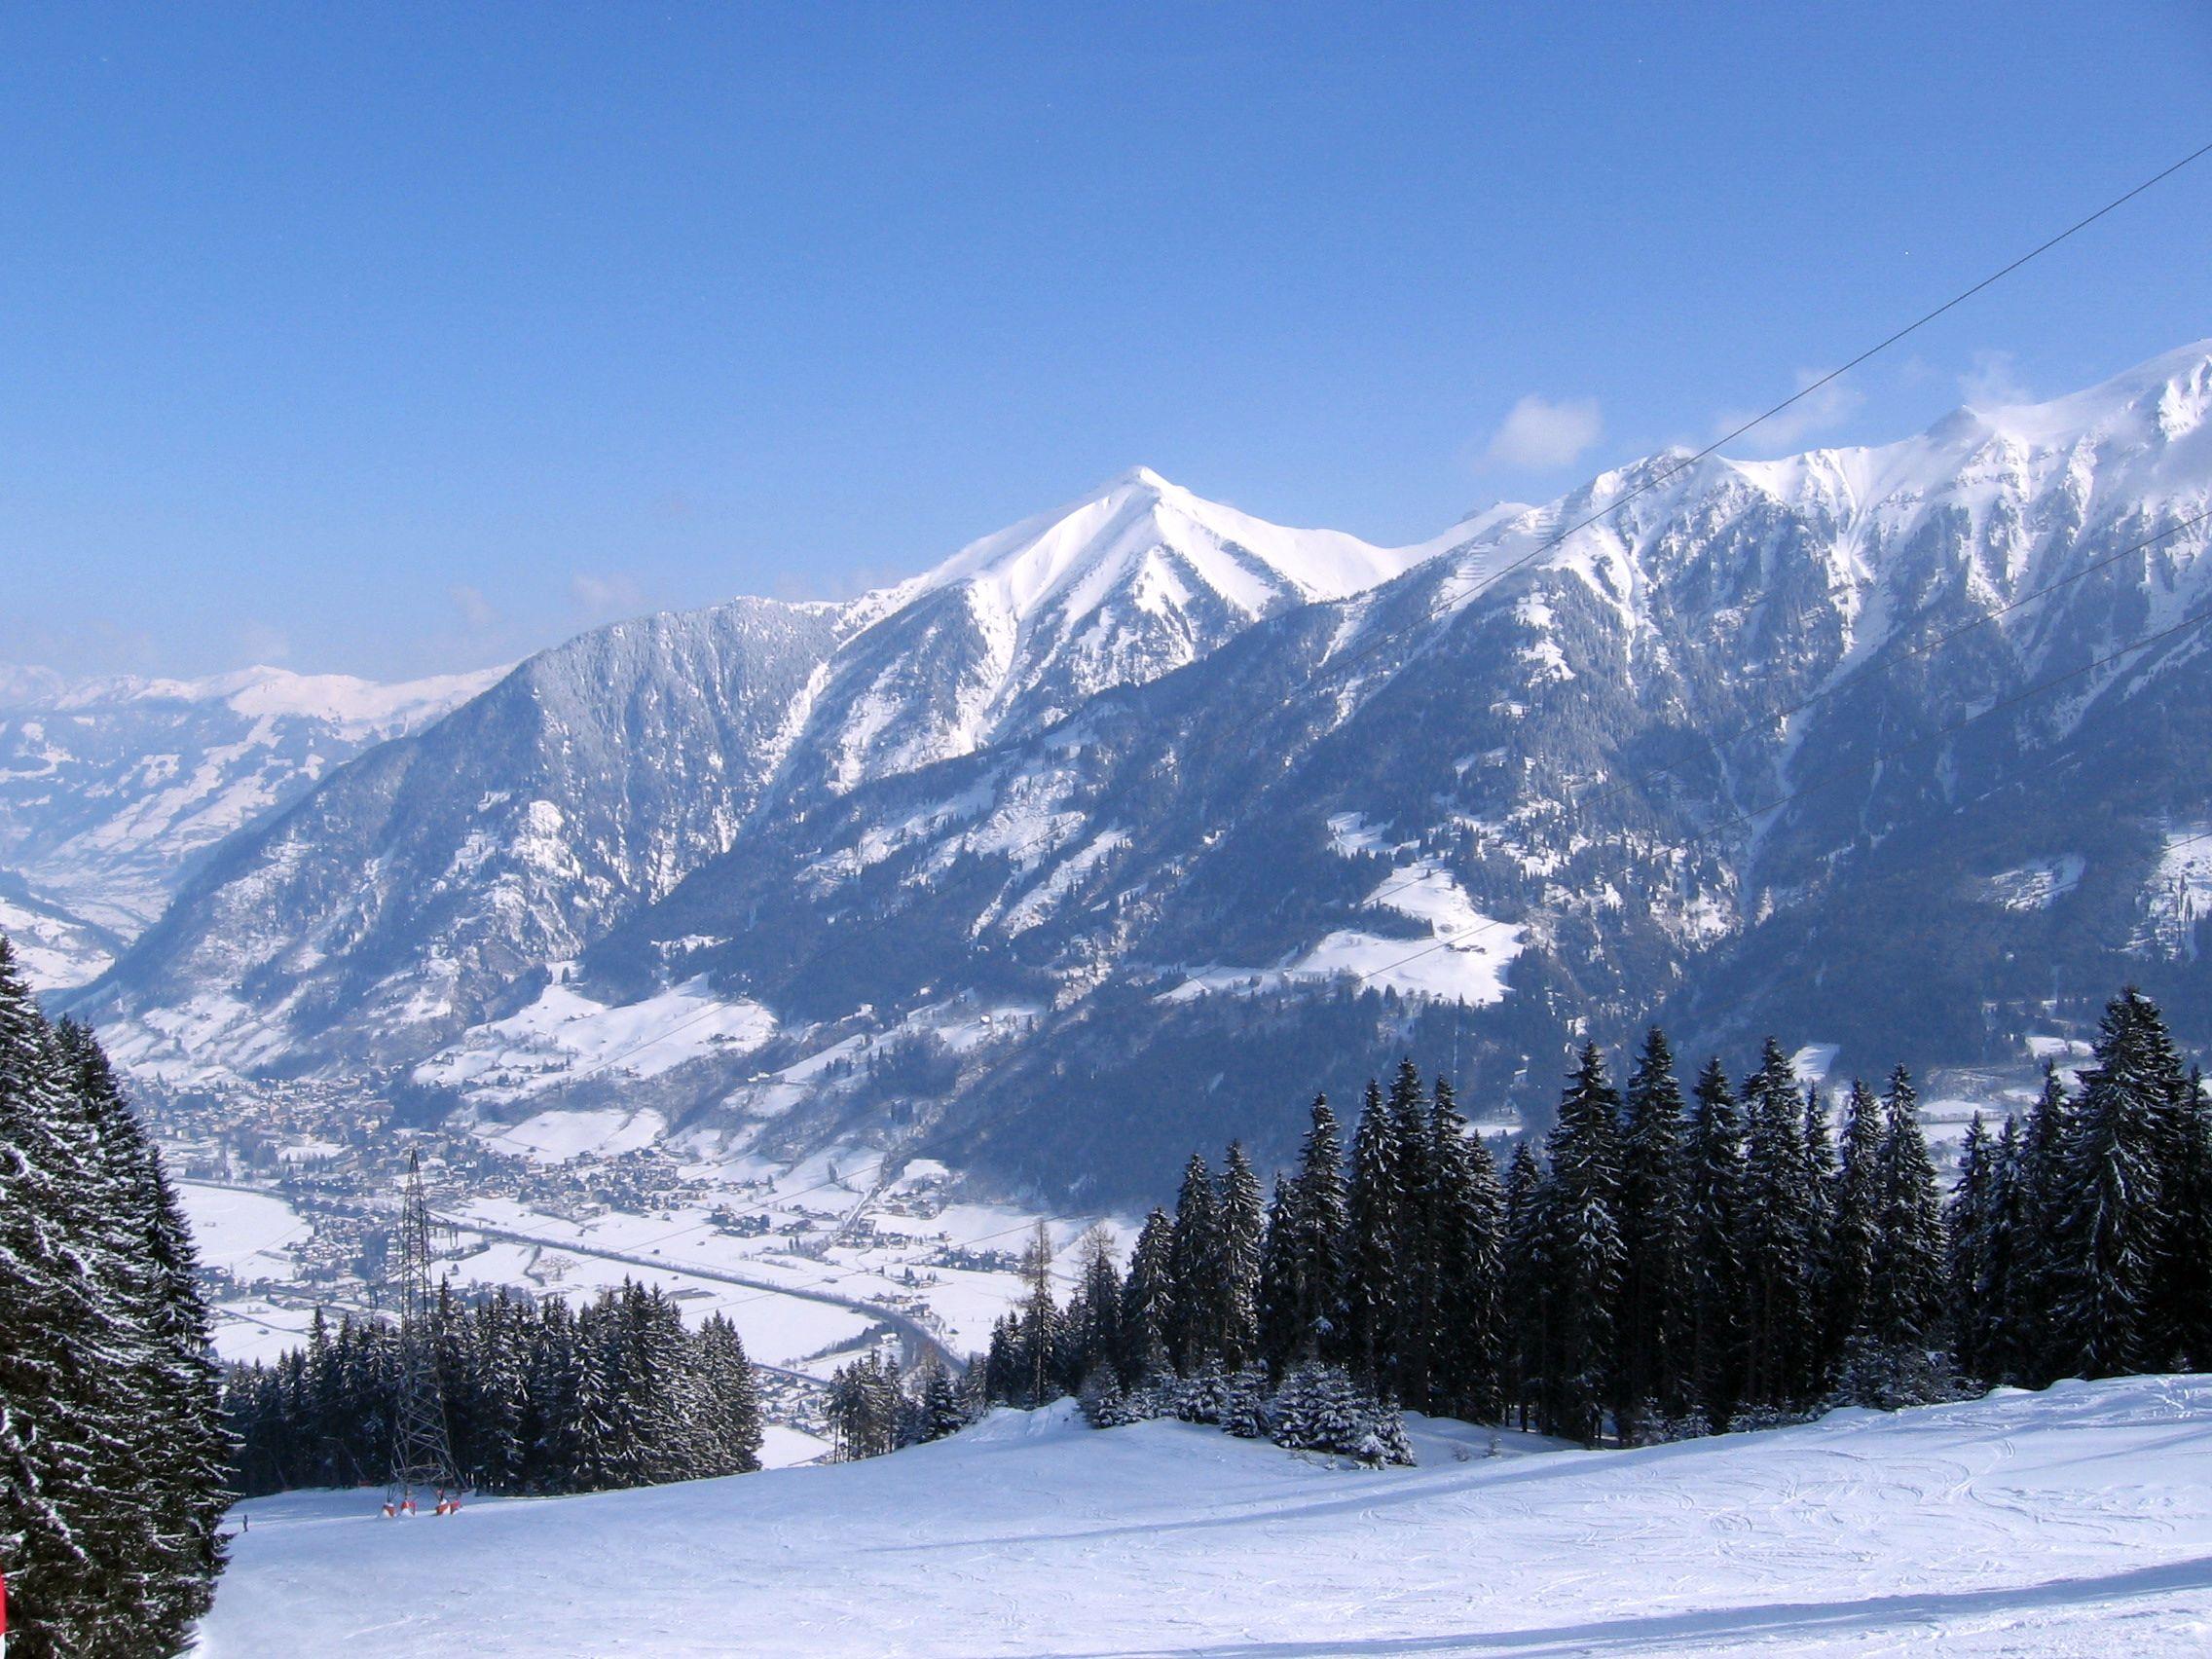 winter-File-BadHogastein-Winter-Wikipedia-the-free-encyclopedia-wallpaper-wp4210708